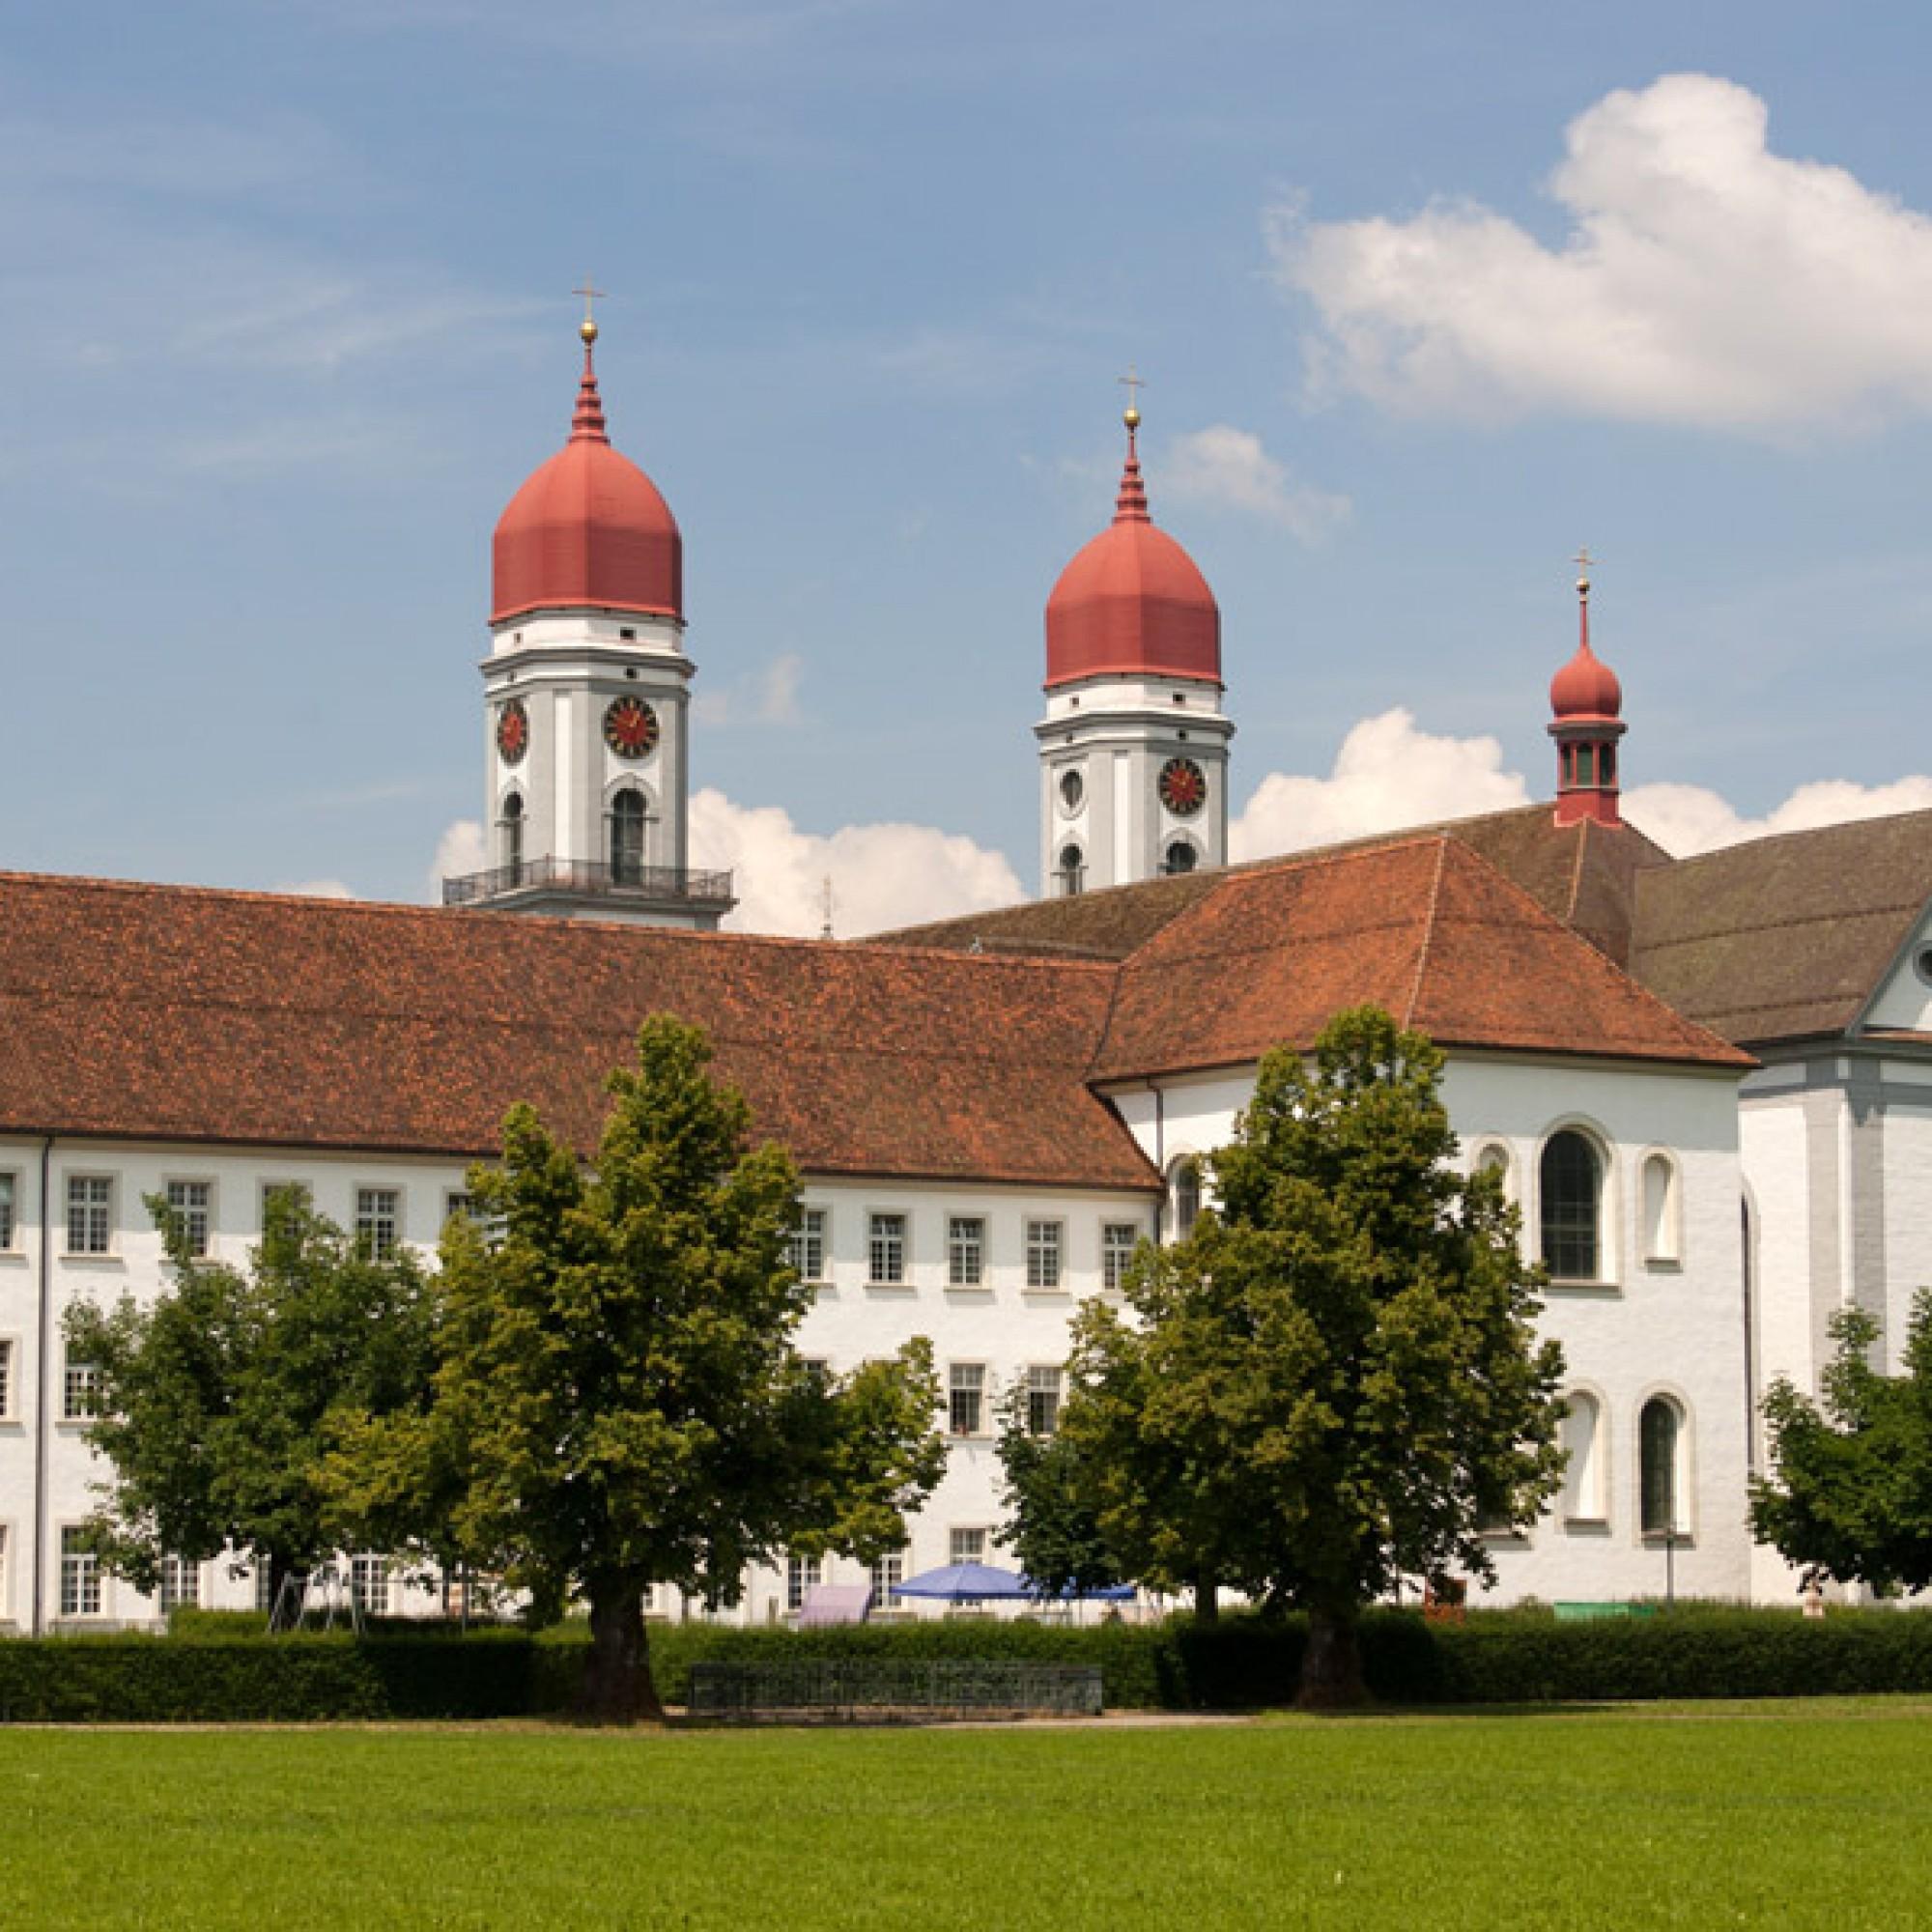 Das Zisterzienserkloster St. Urban in Pfaffnau LU. (Roland Zumbühl, wikimedia.org, CC)